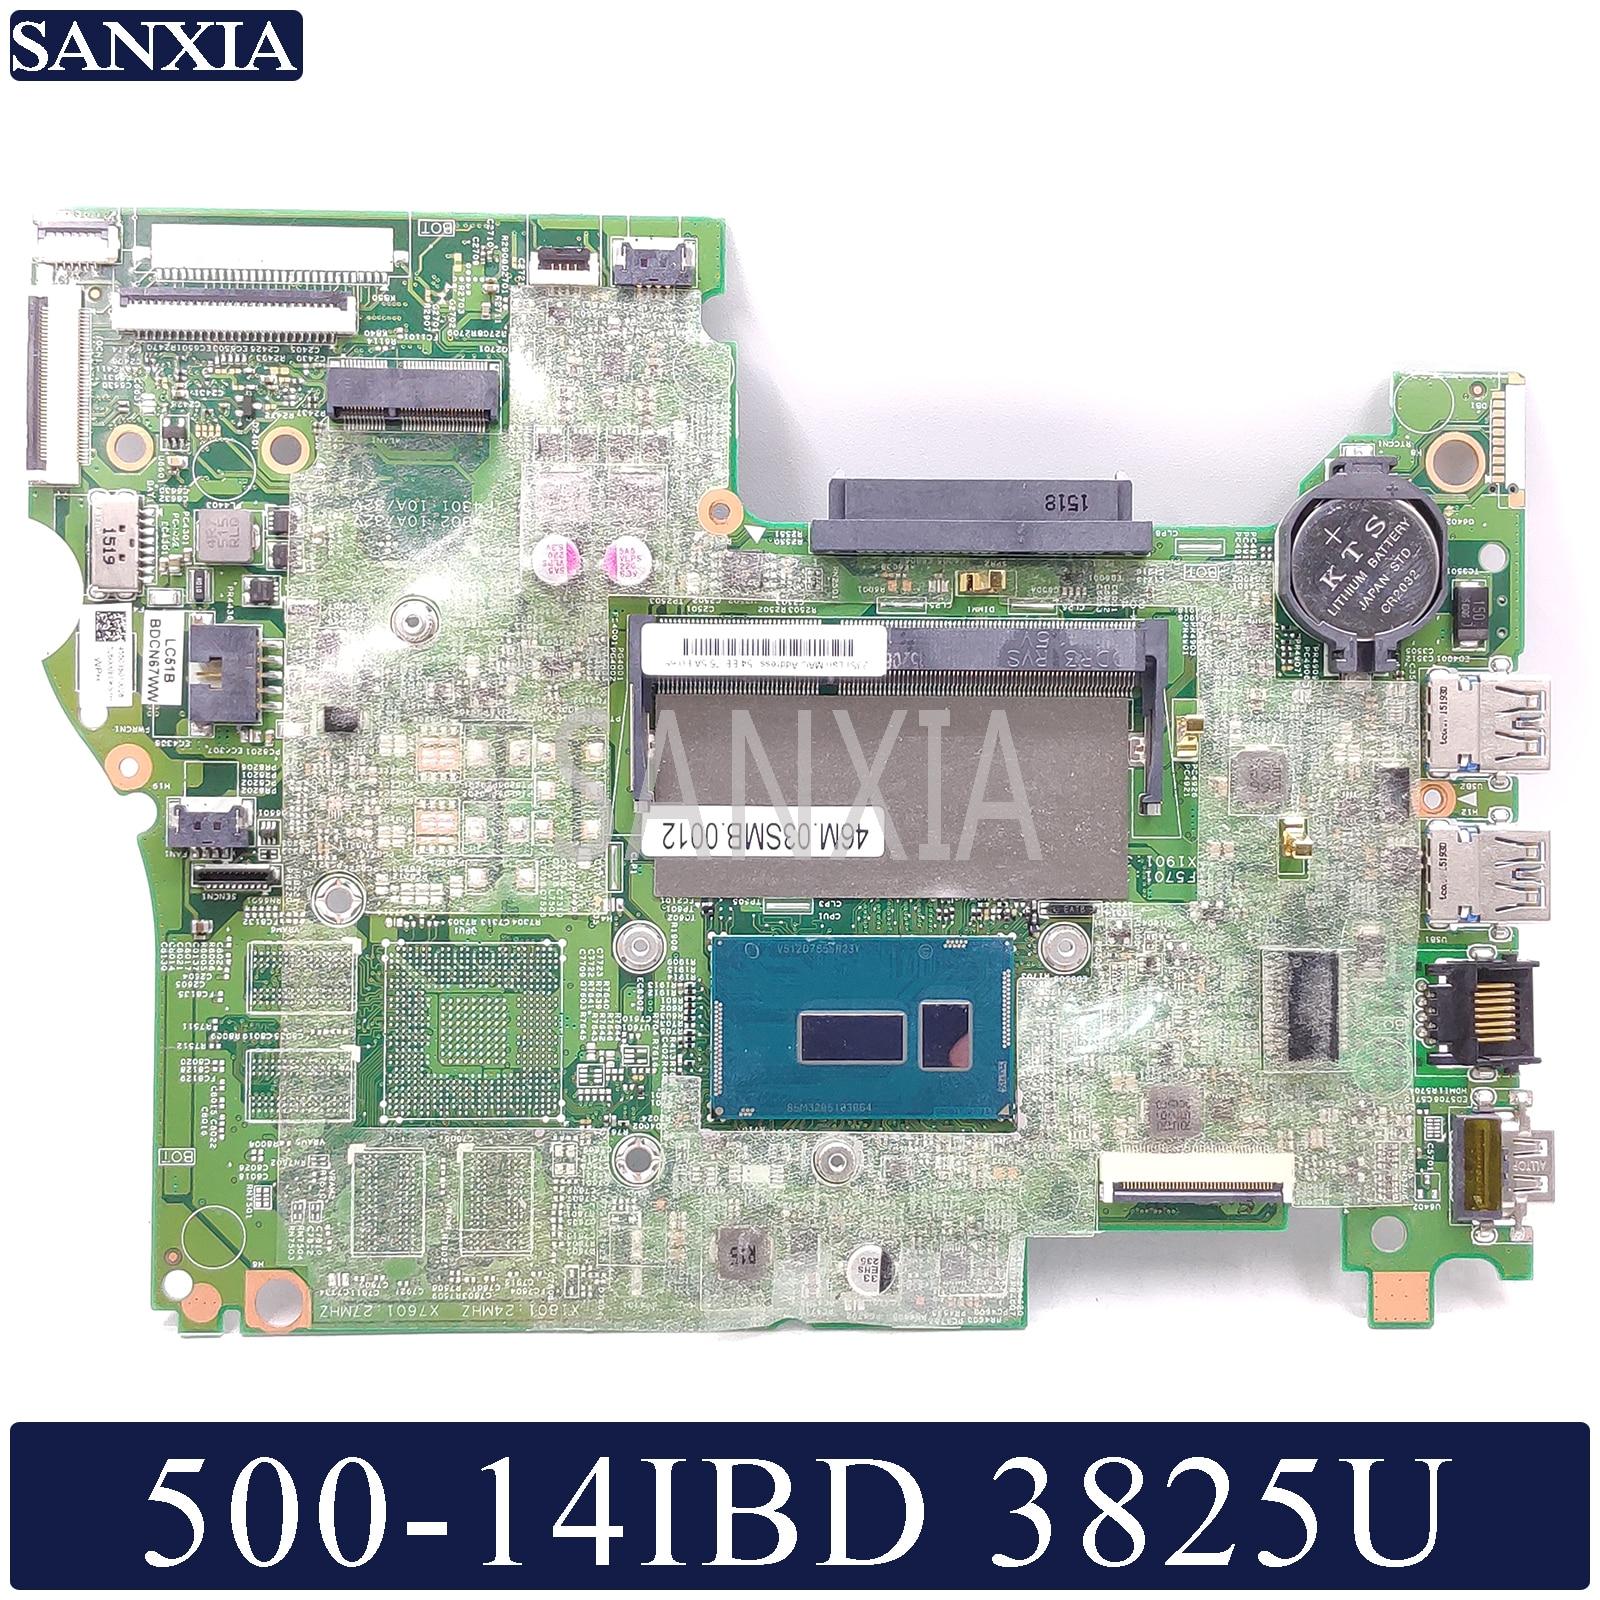 KEFU 14217-1M Laotop Motherboard For Lenovo YOGA 500-14IBD Test Original Mainboard 3825U-CPU